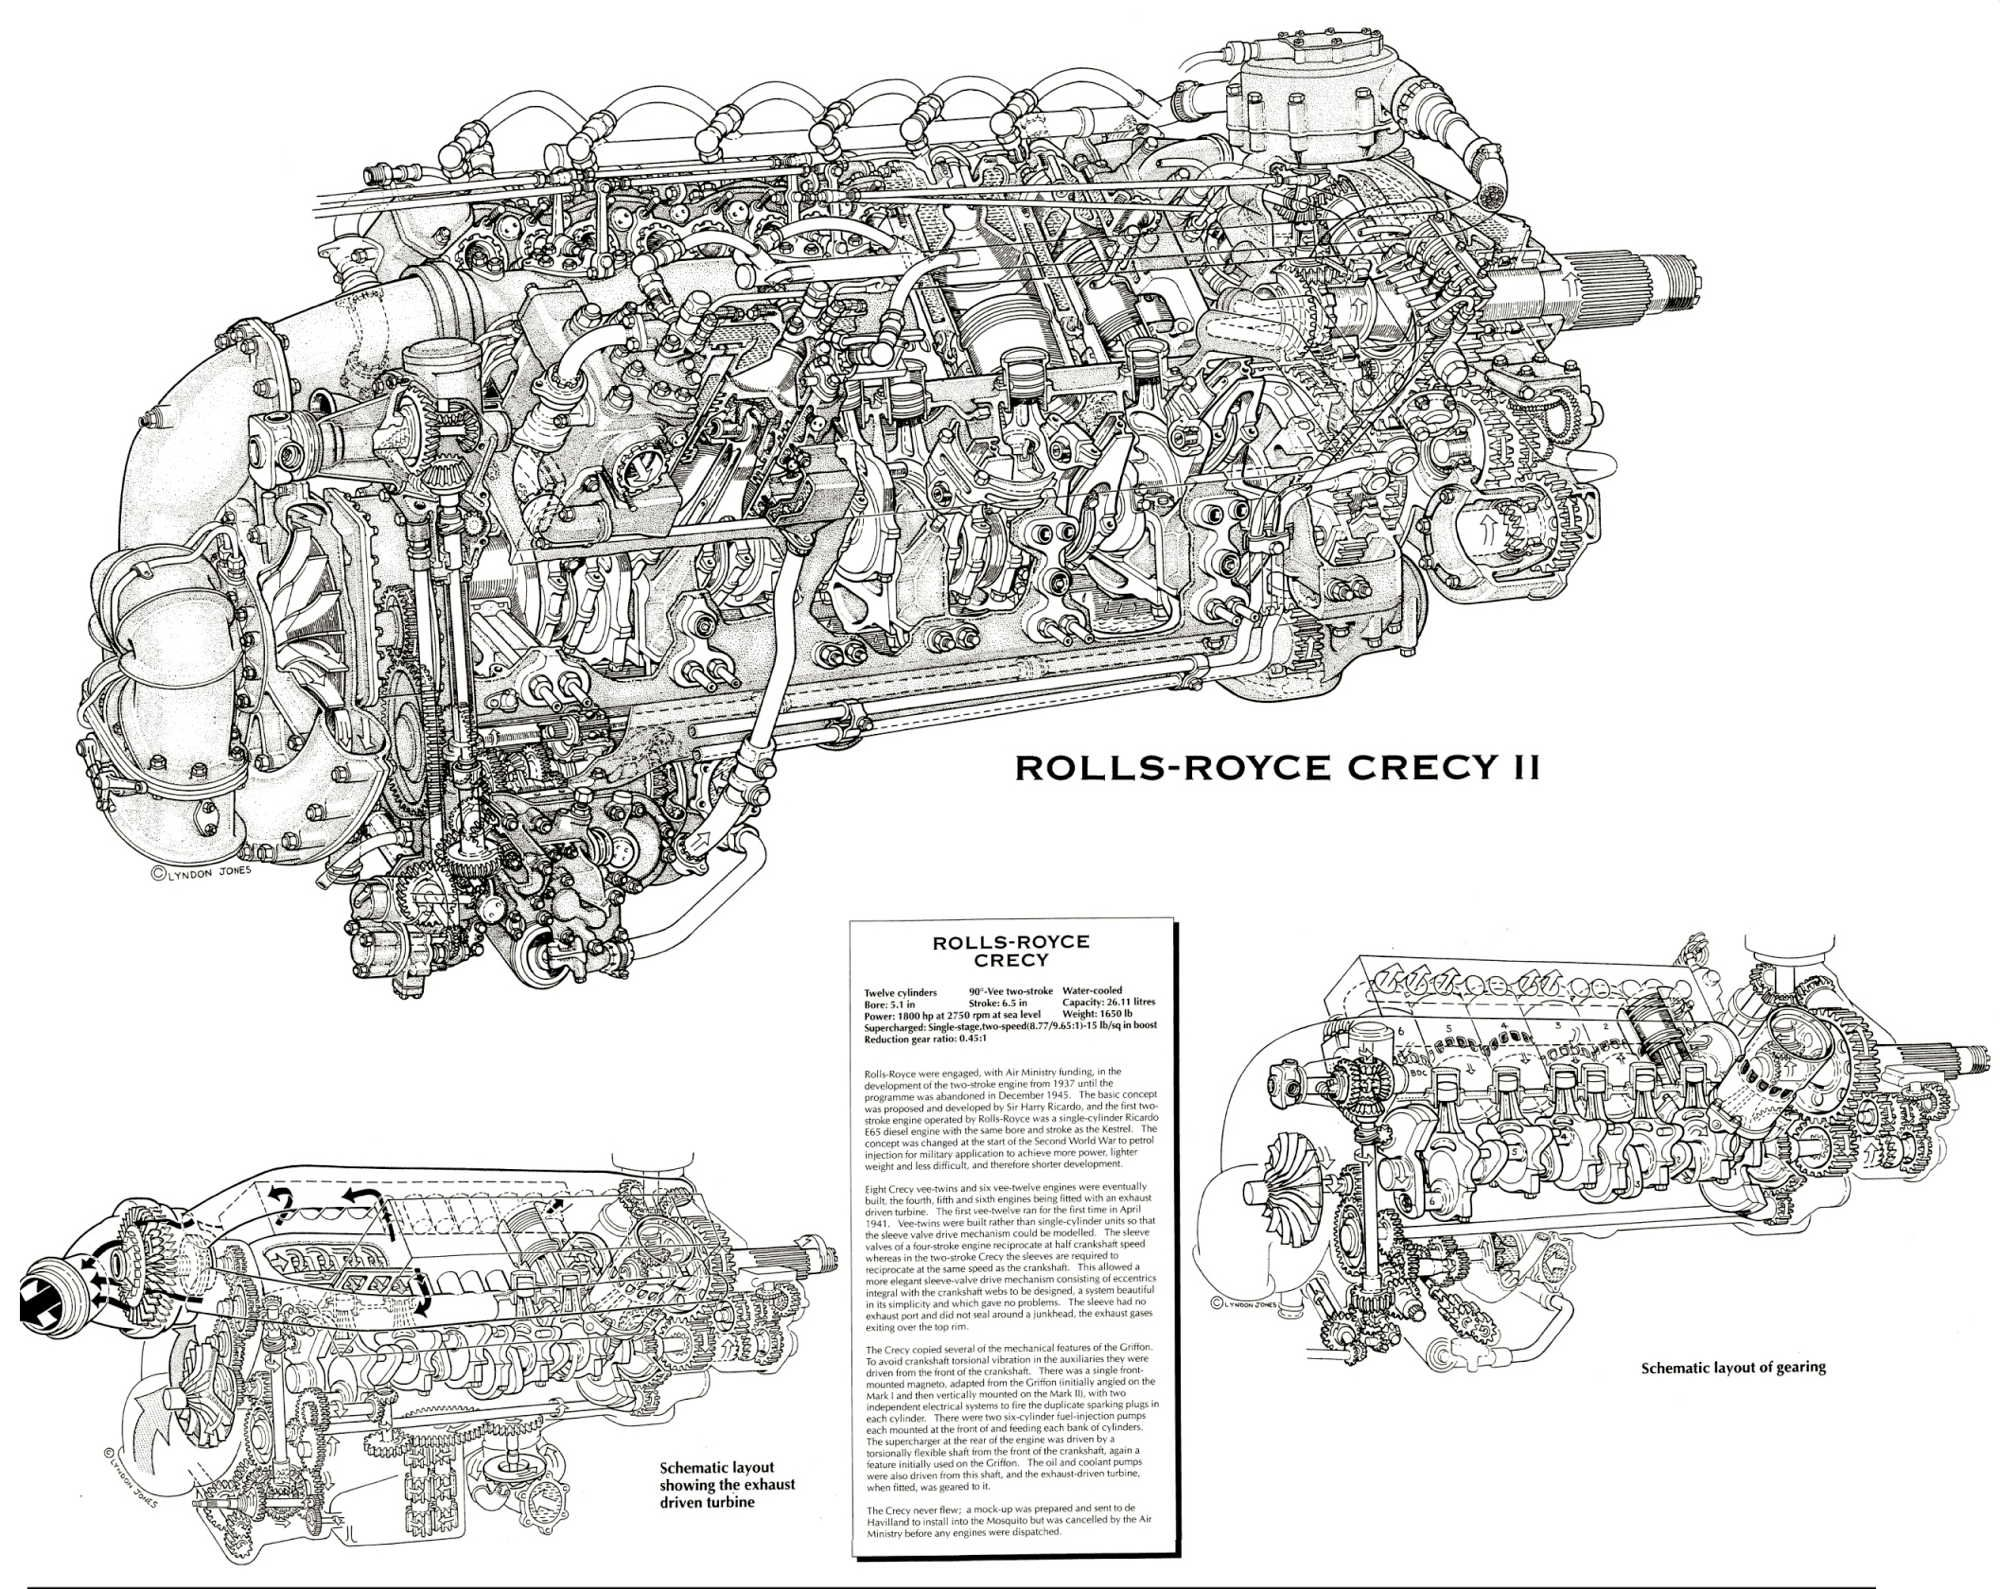 small resolution of rolls royce crecy ii engine cutaway